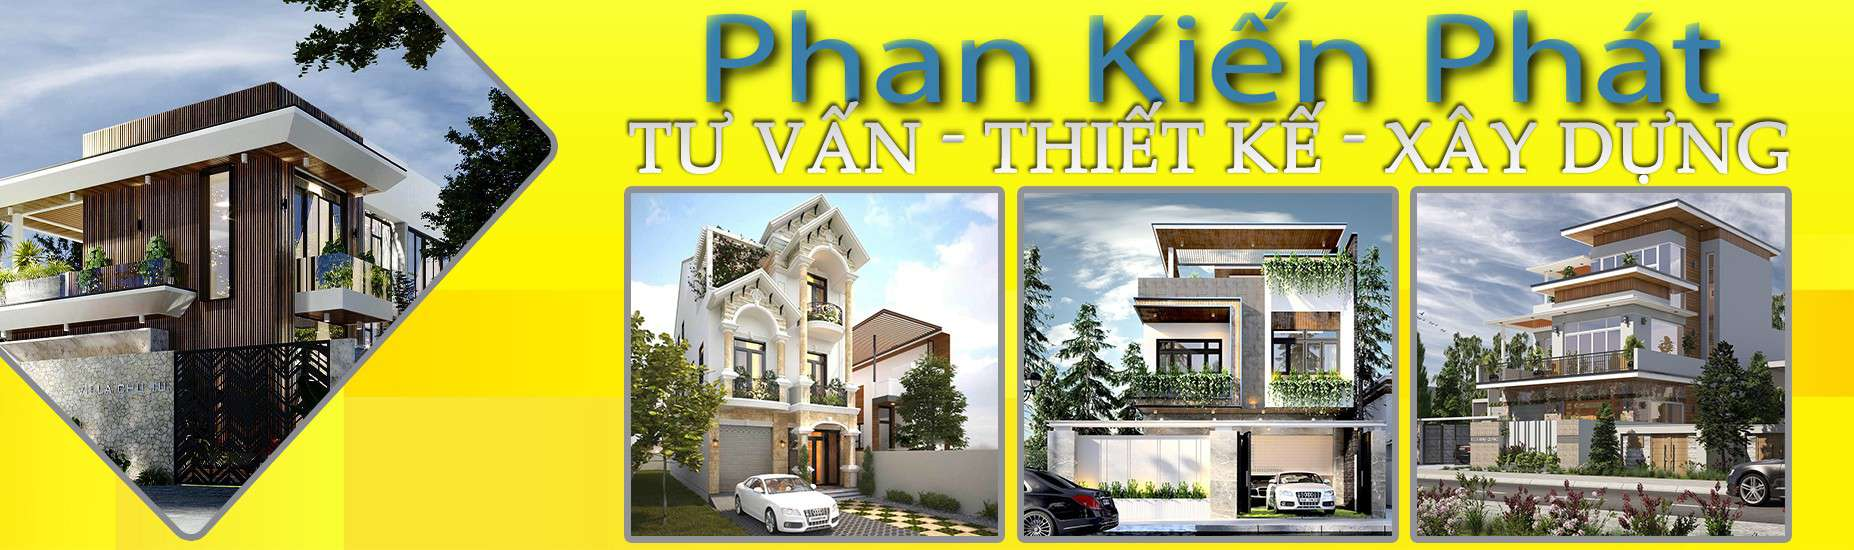 Phankienphat